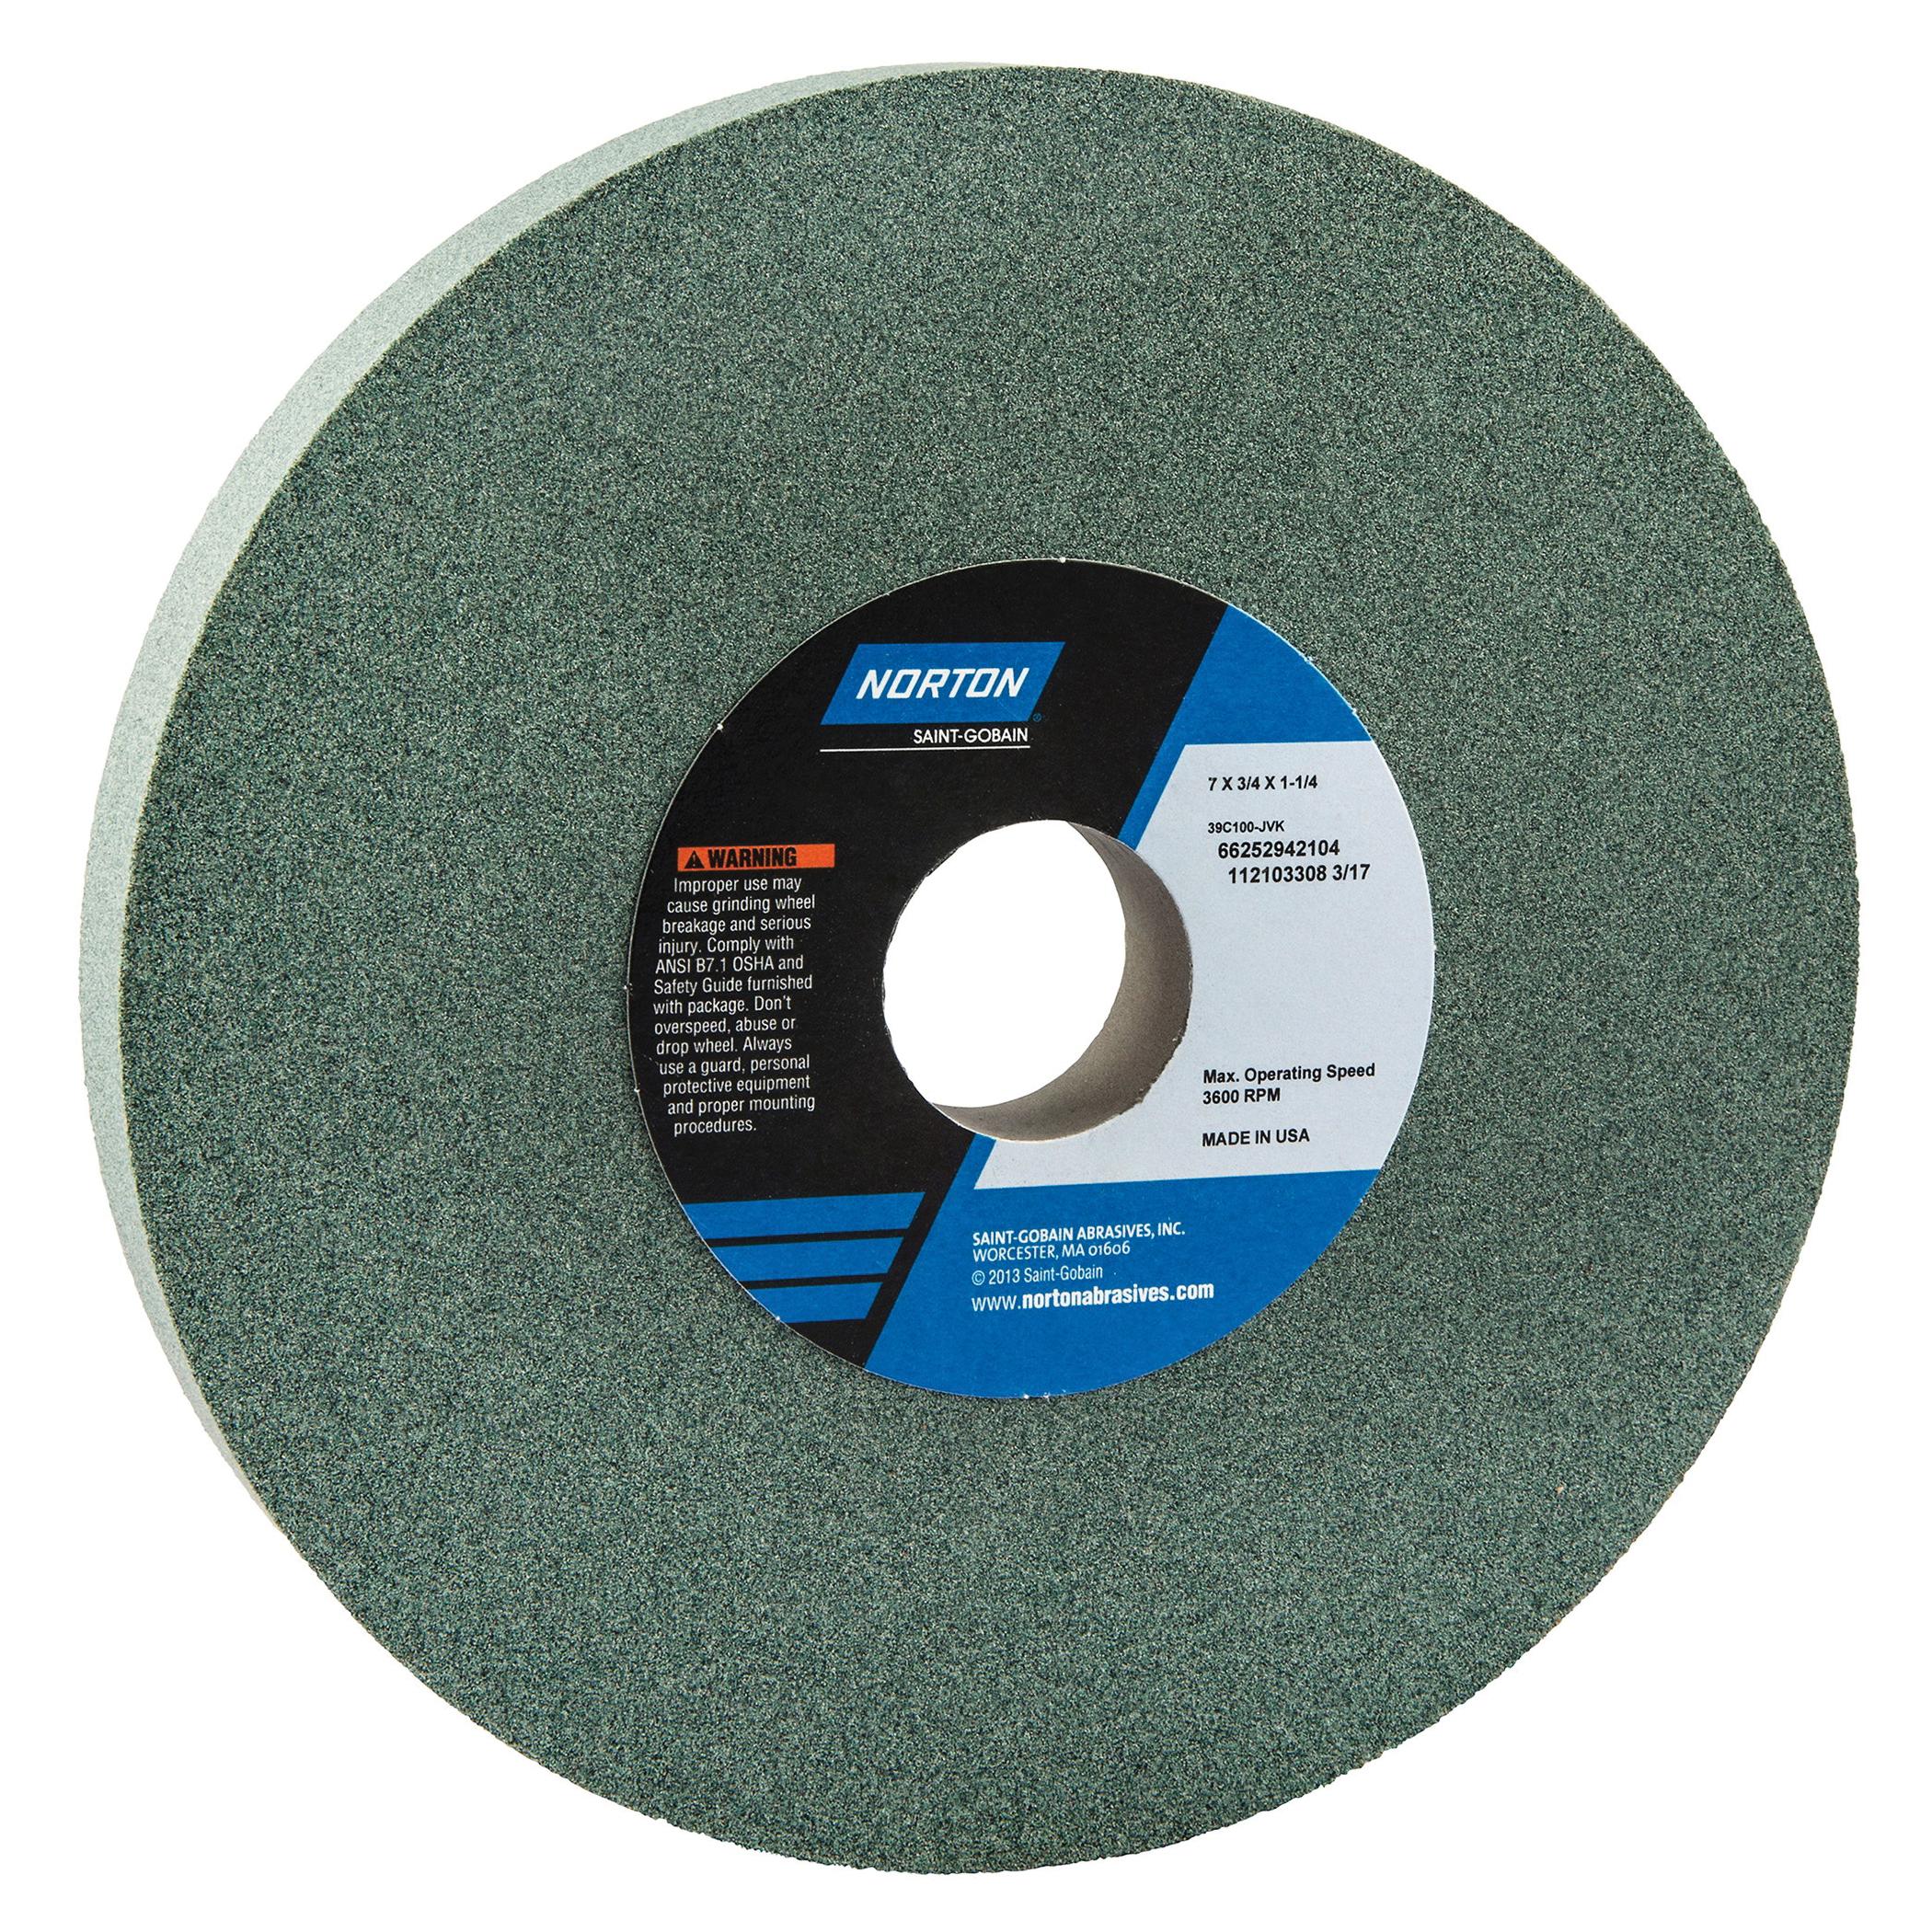 Norton® 66252942104 39C Straight Toolroom Wheel, 7 in Dia x 3/4 in THK, 1-1/4 in Center Hole, 100 Grit, Silicon Carbide Abrasive